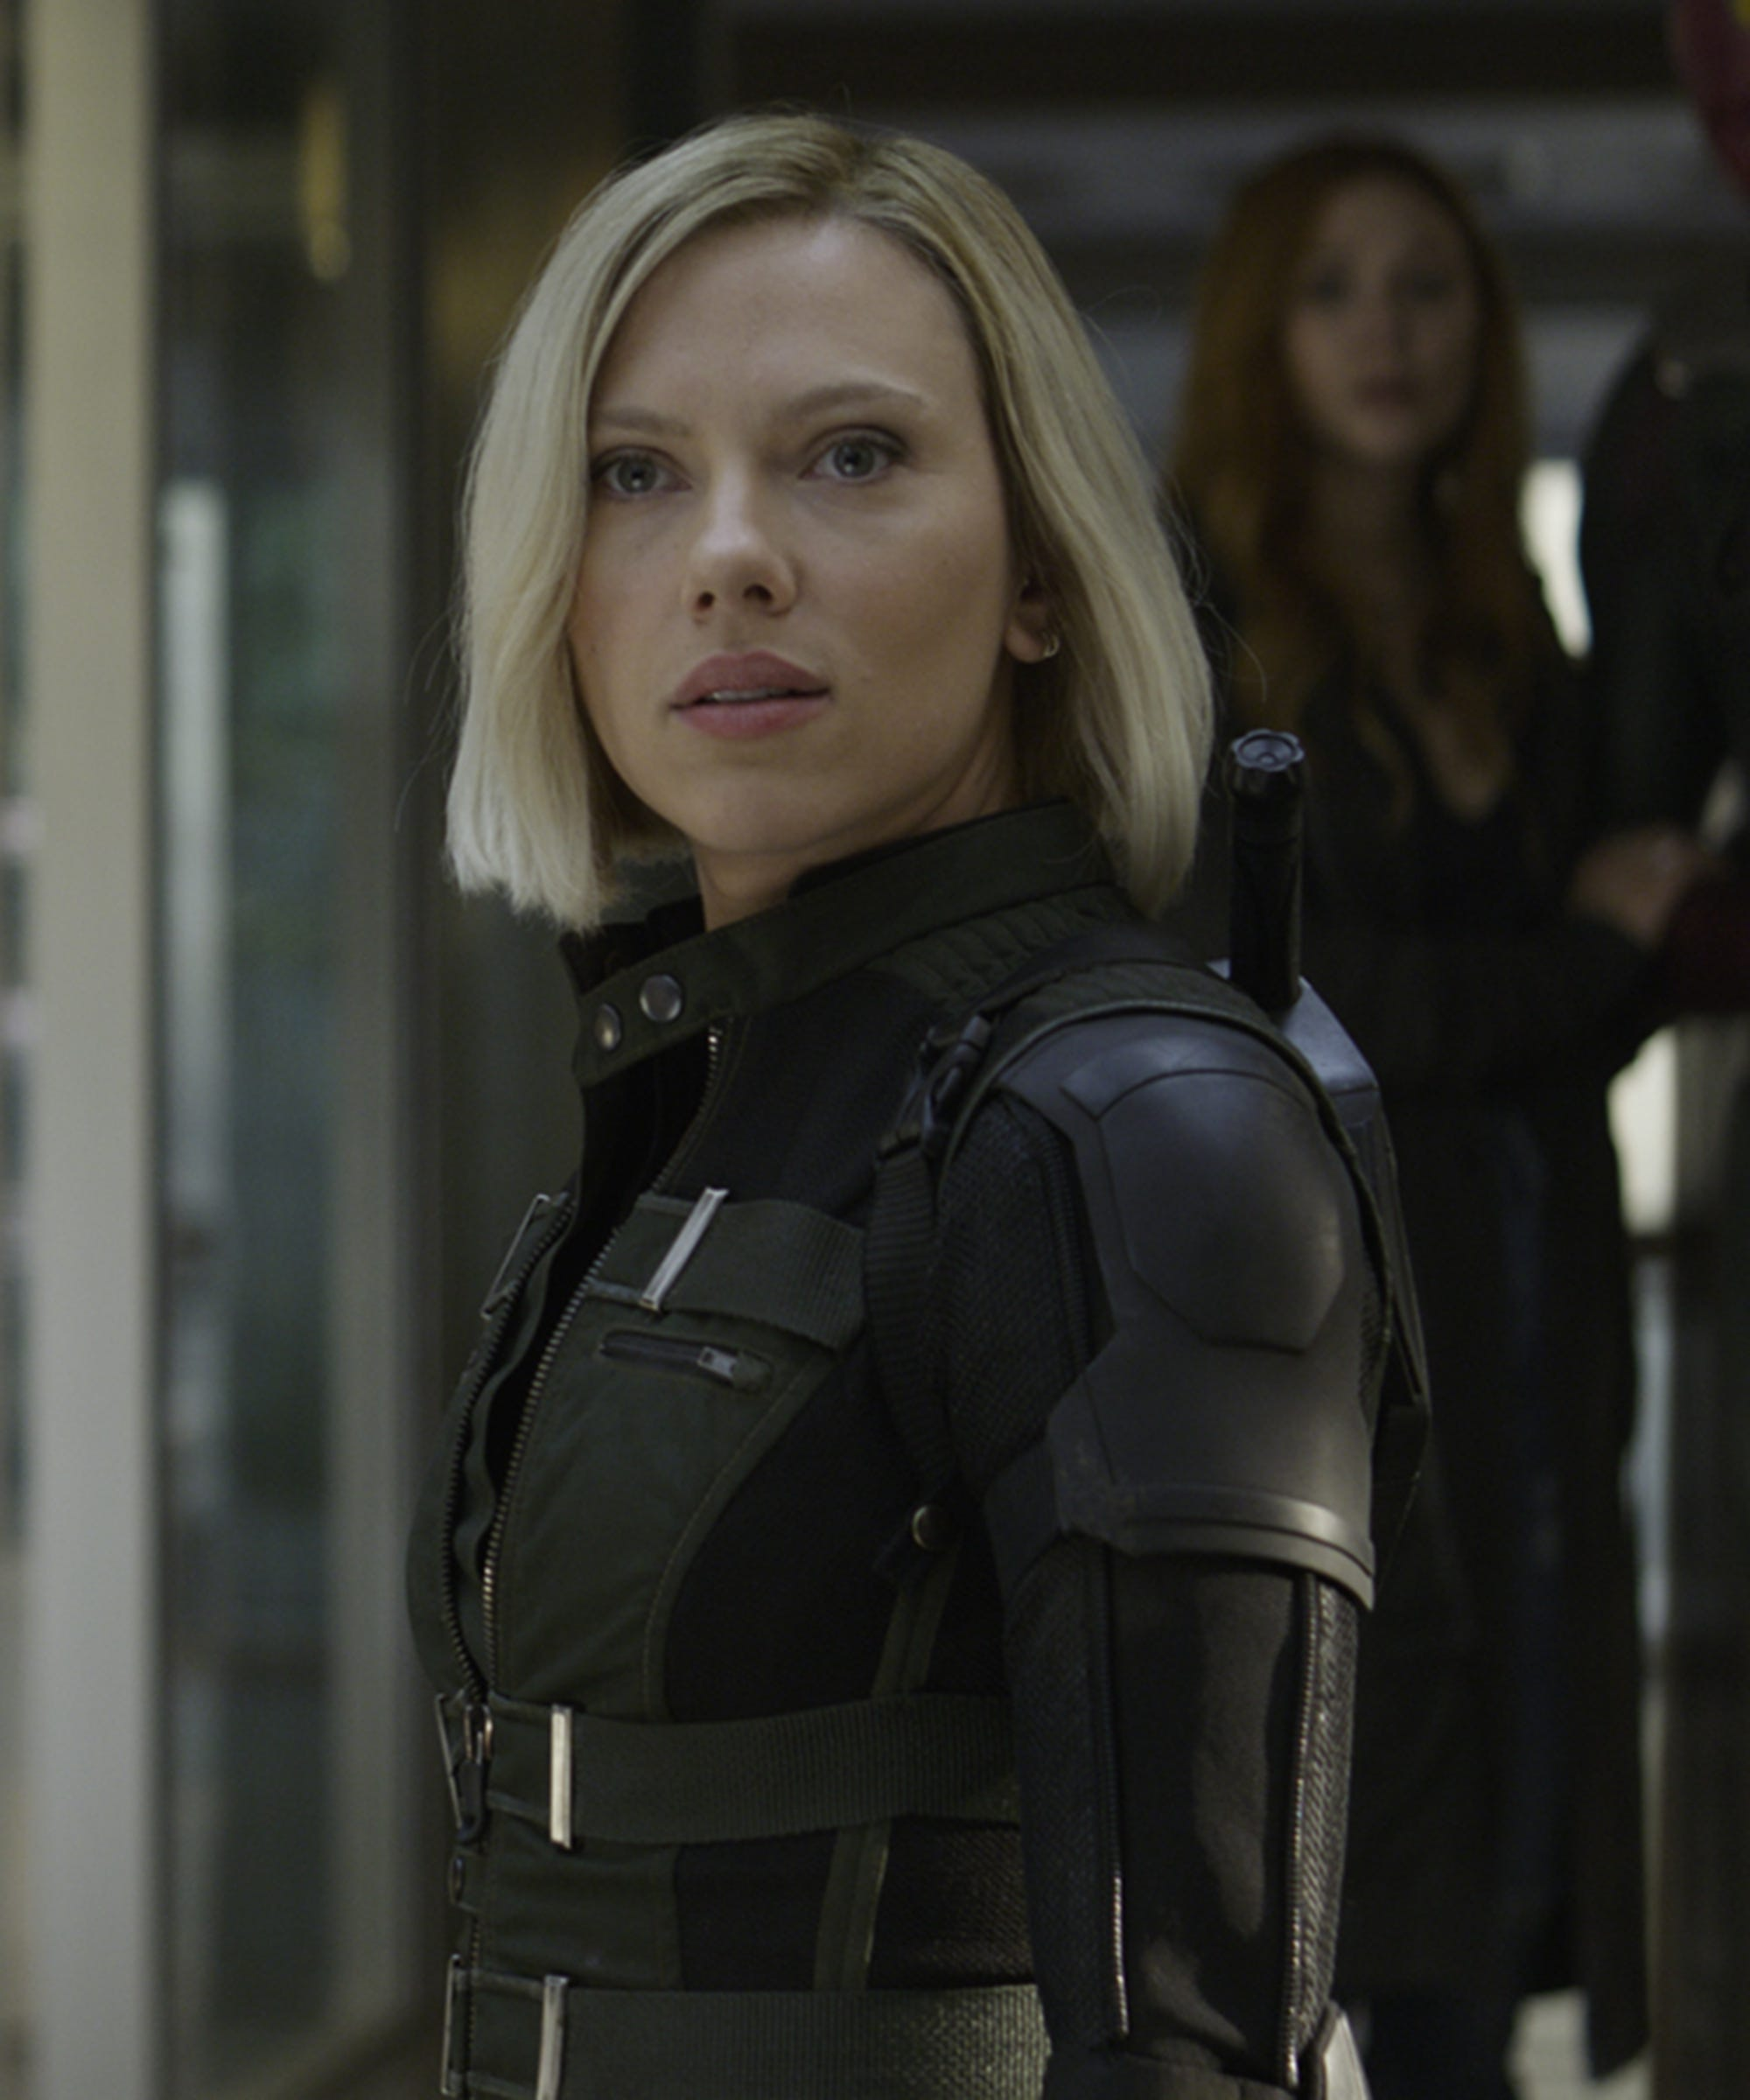 Is Black Widow Movie Happening After Avengers Endgame